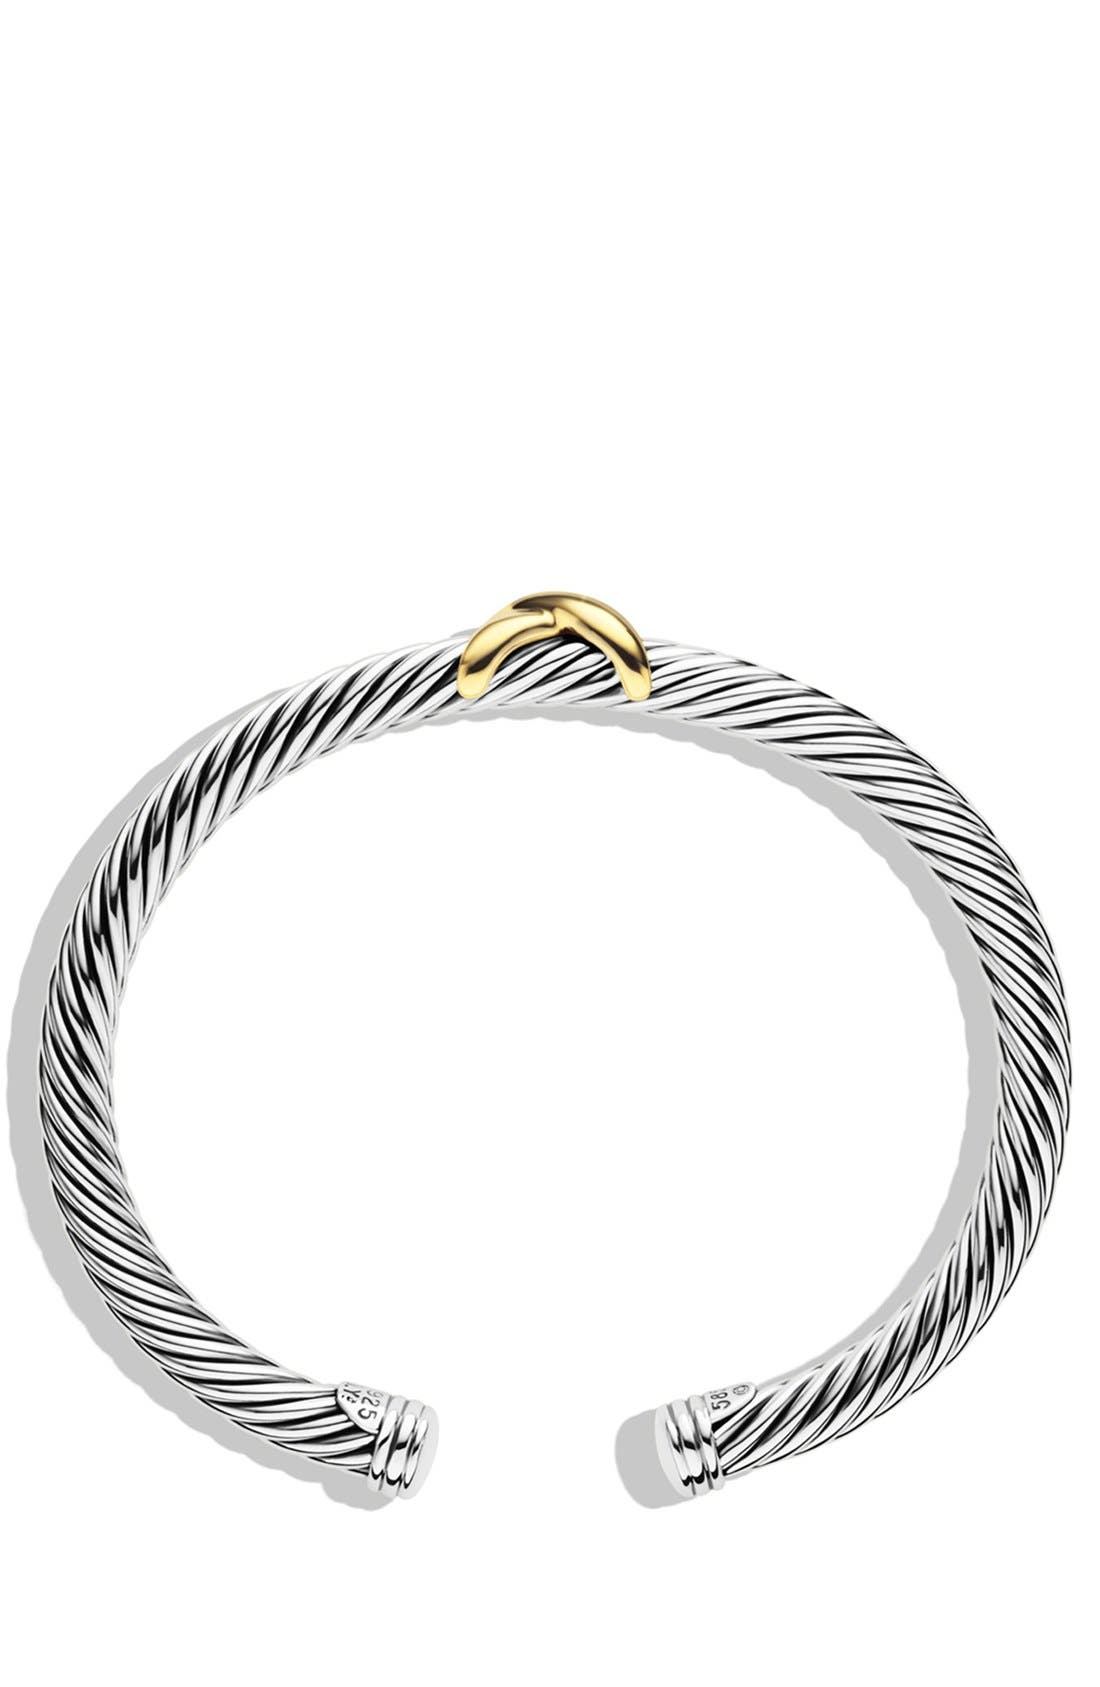 Alternate Image 2  - David Yurman 'X' Bracelet with Gold